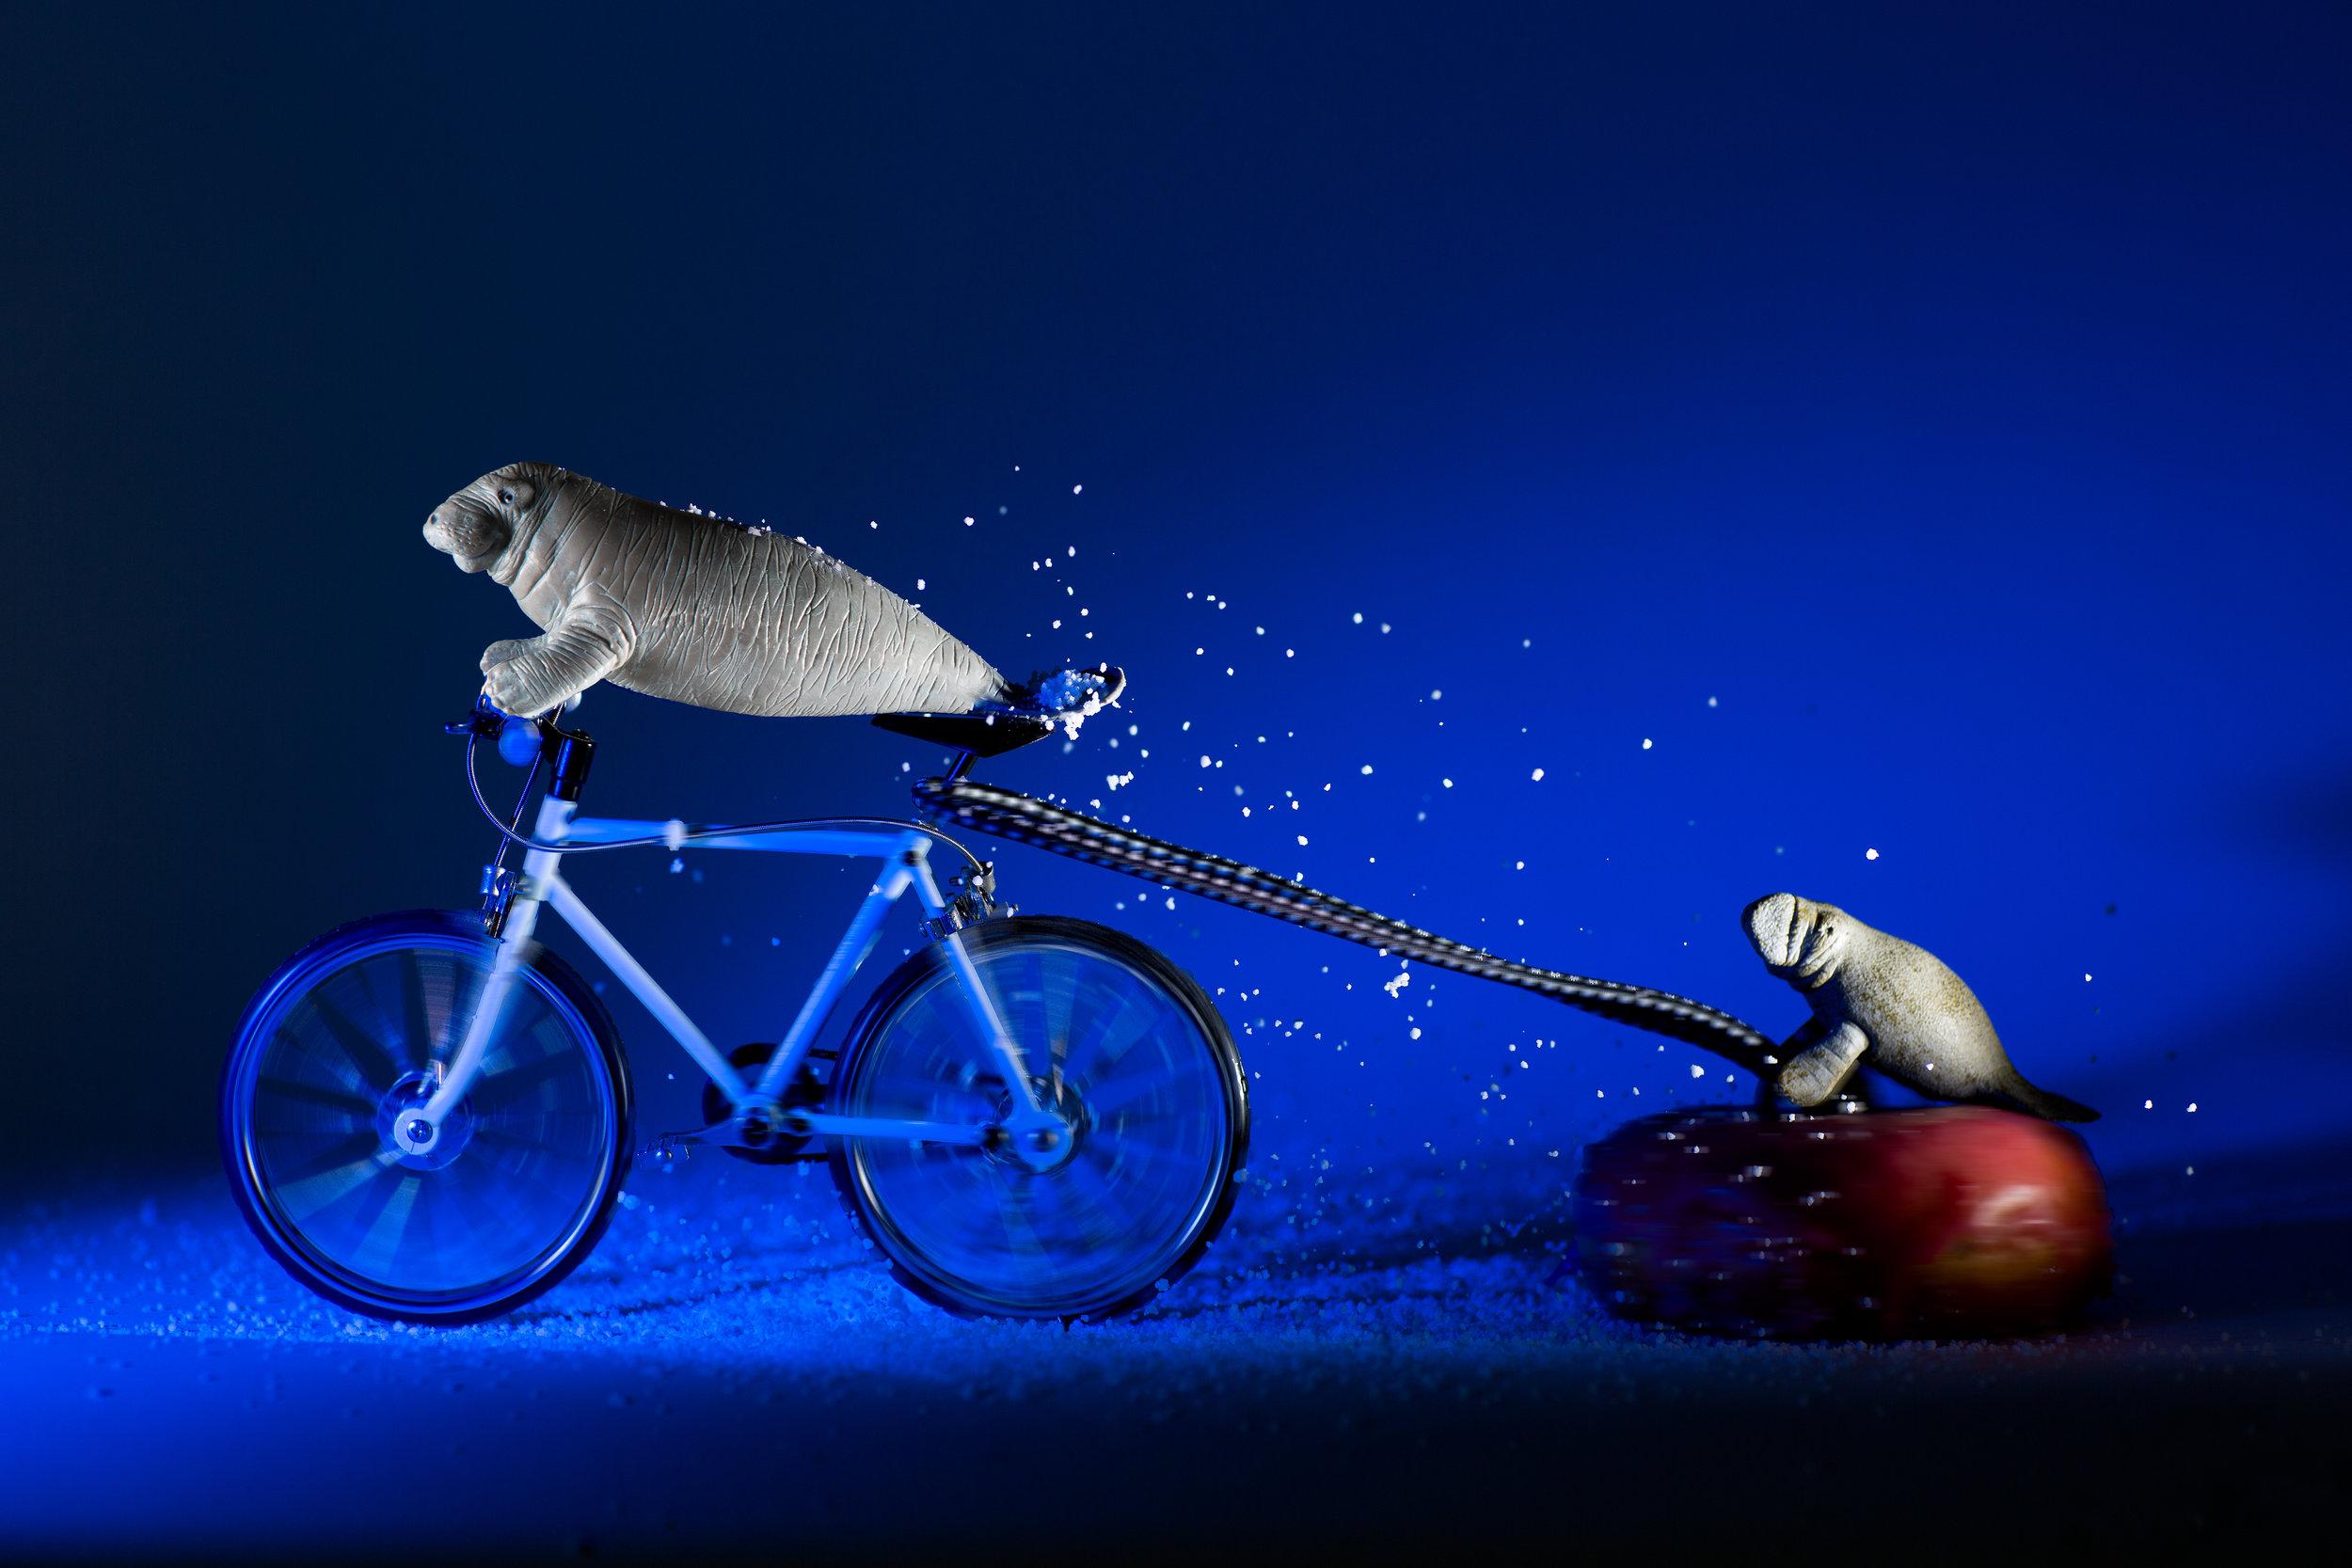 Manatee Cub Pulled by Bike